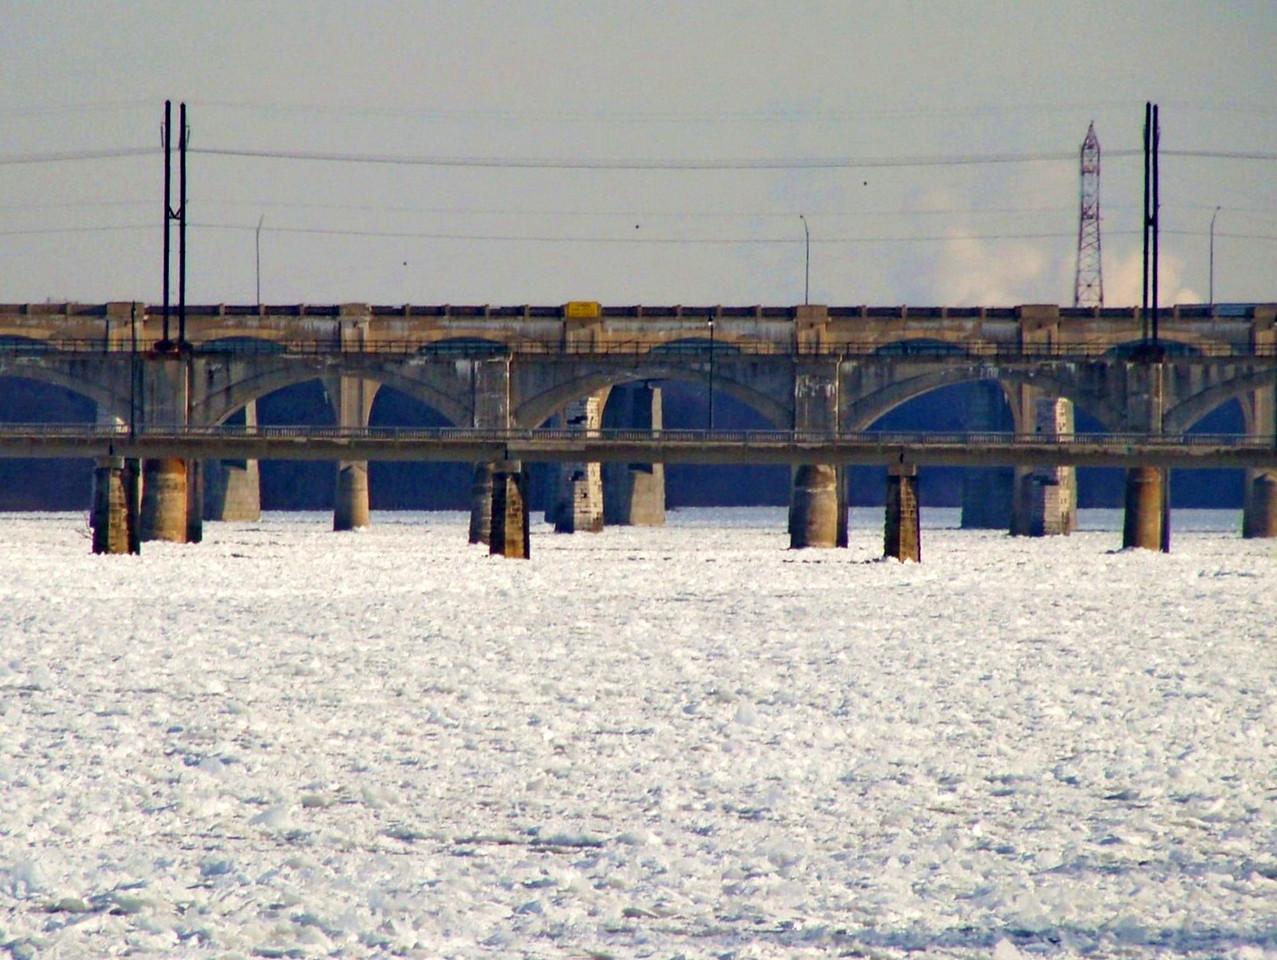 Susquehanna River in January